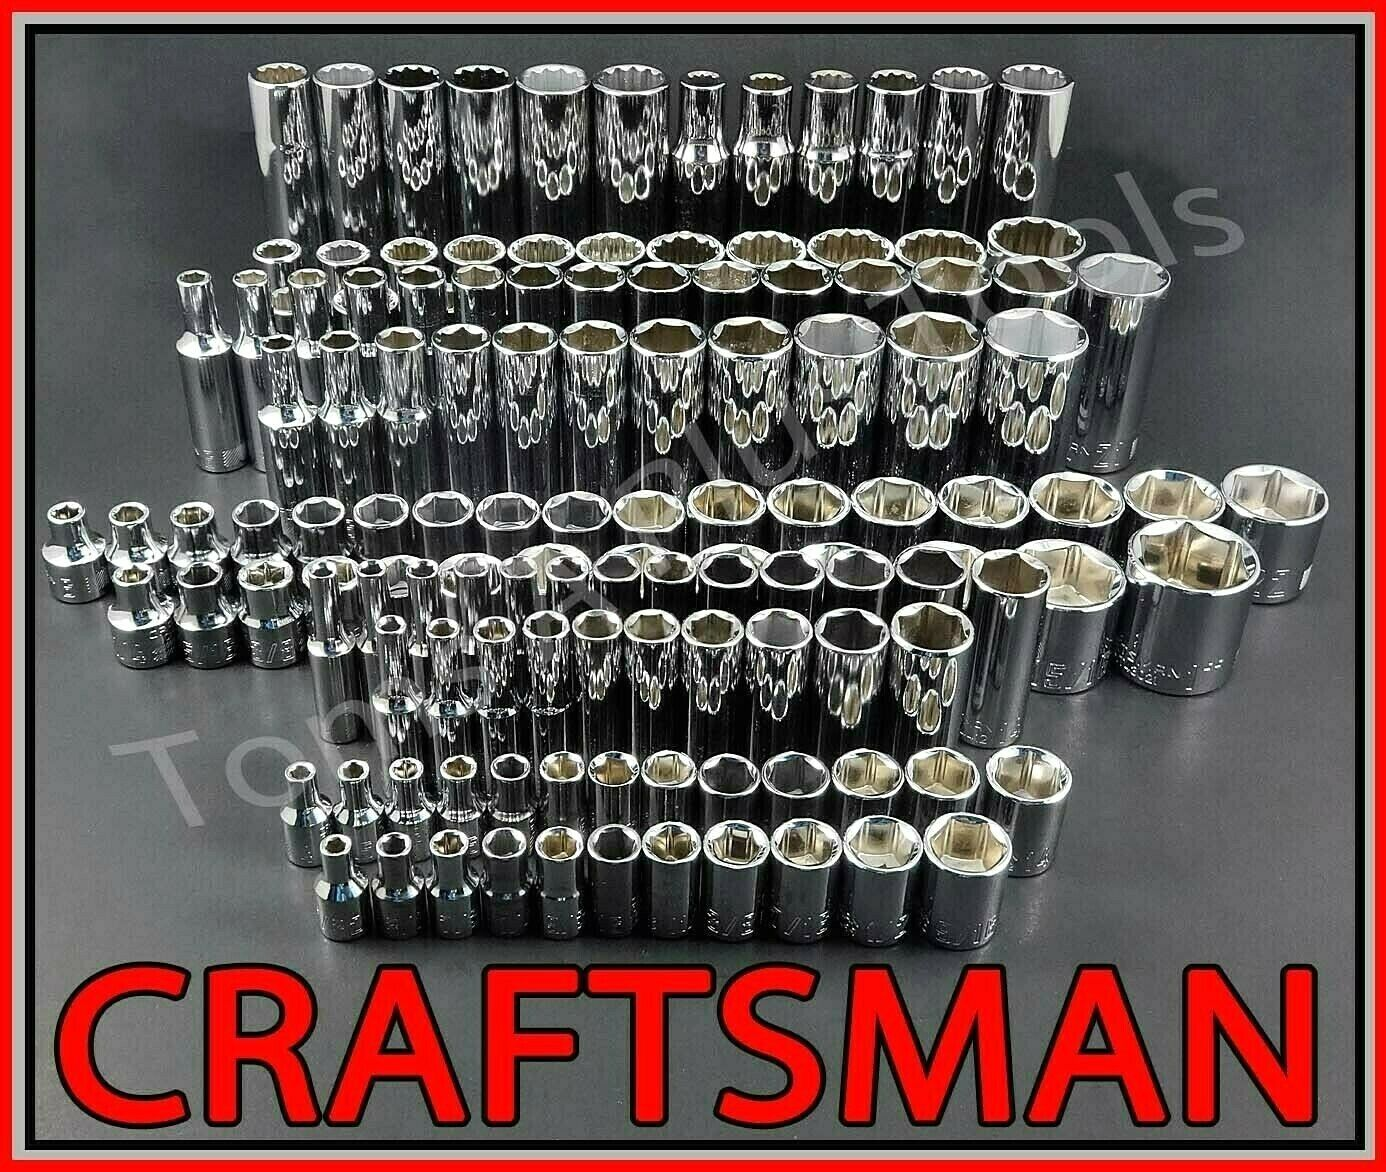 CRAFTSMAN HAND TOOLS 136pc 1/4 3/8 1/2 SAE METRIC MM Ratchet